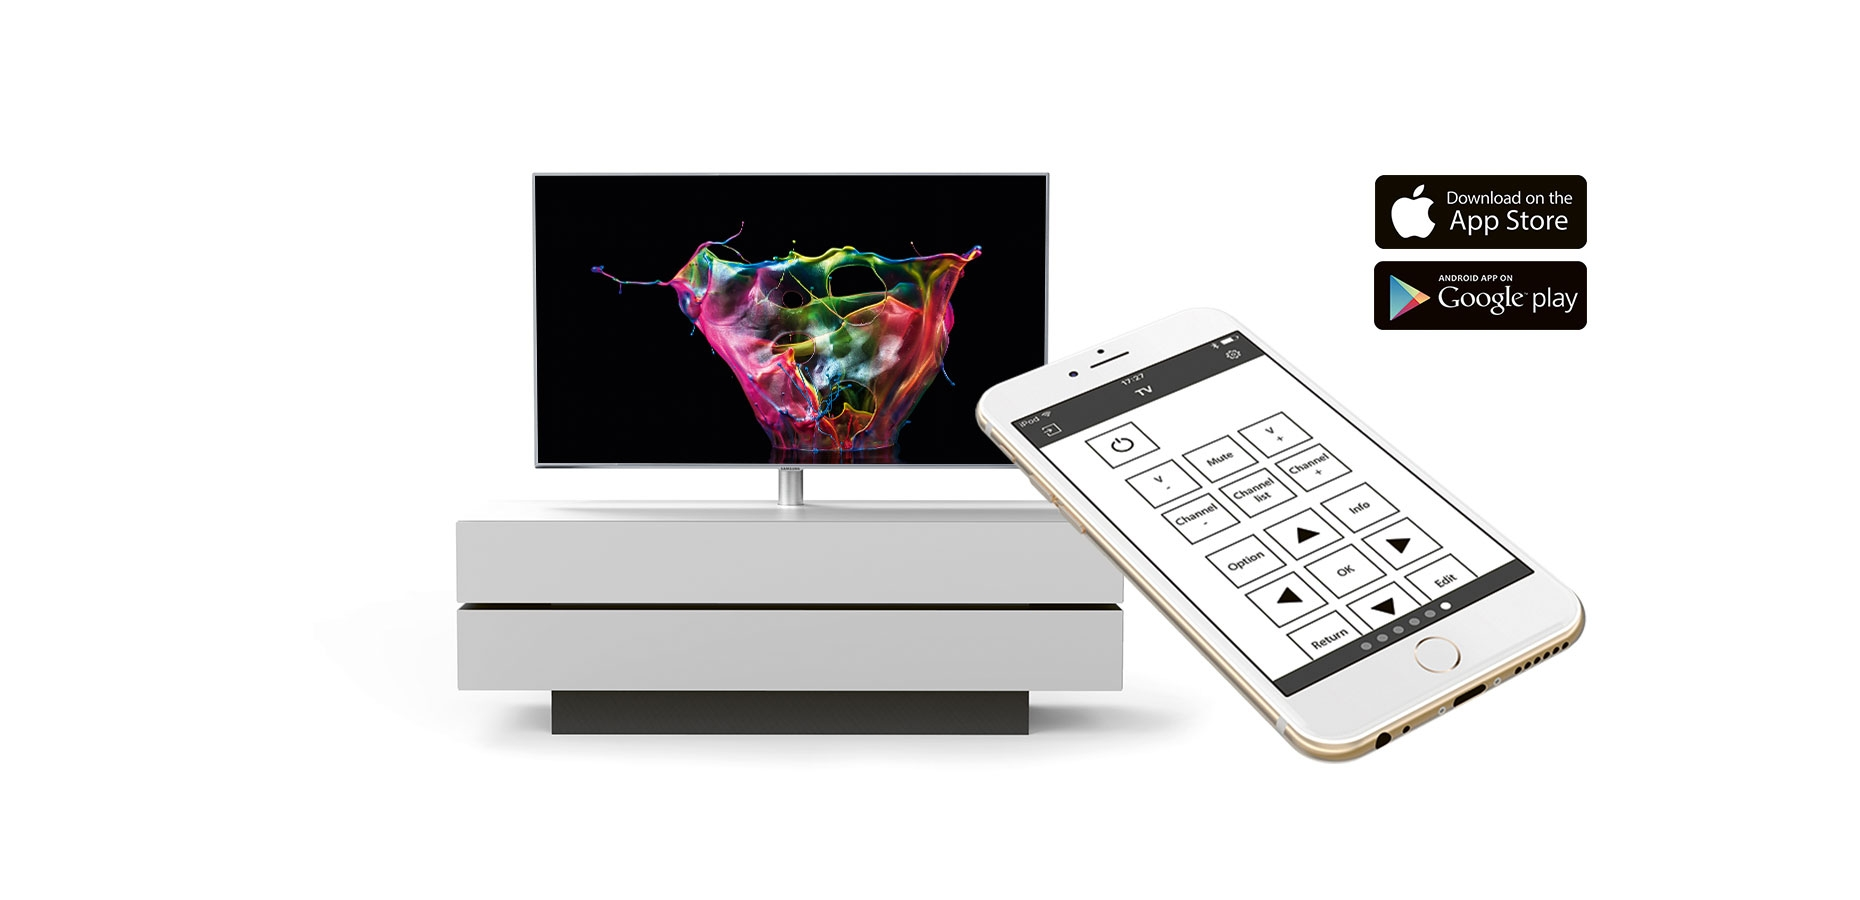 spectra-smart-control